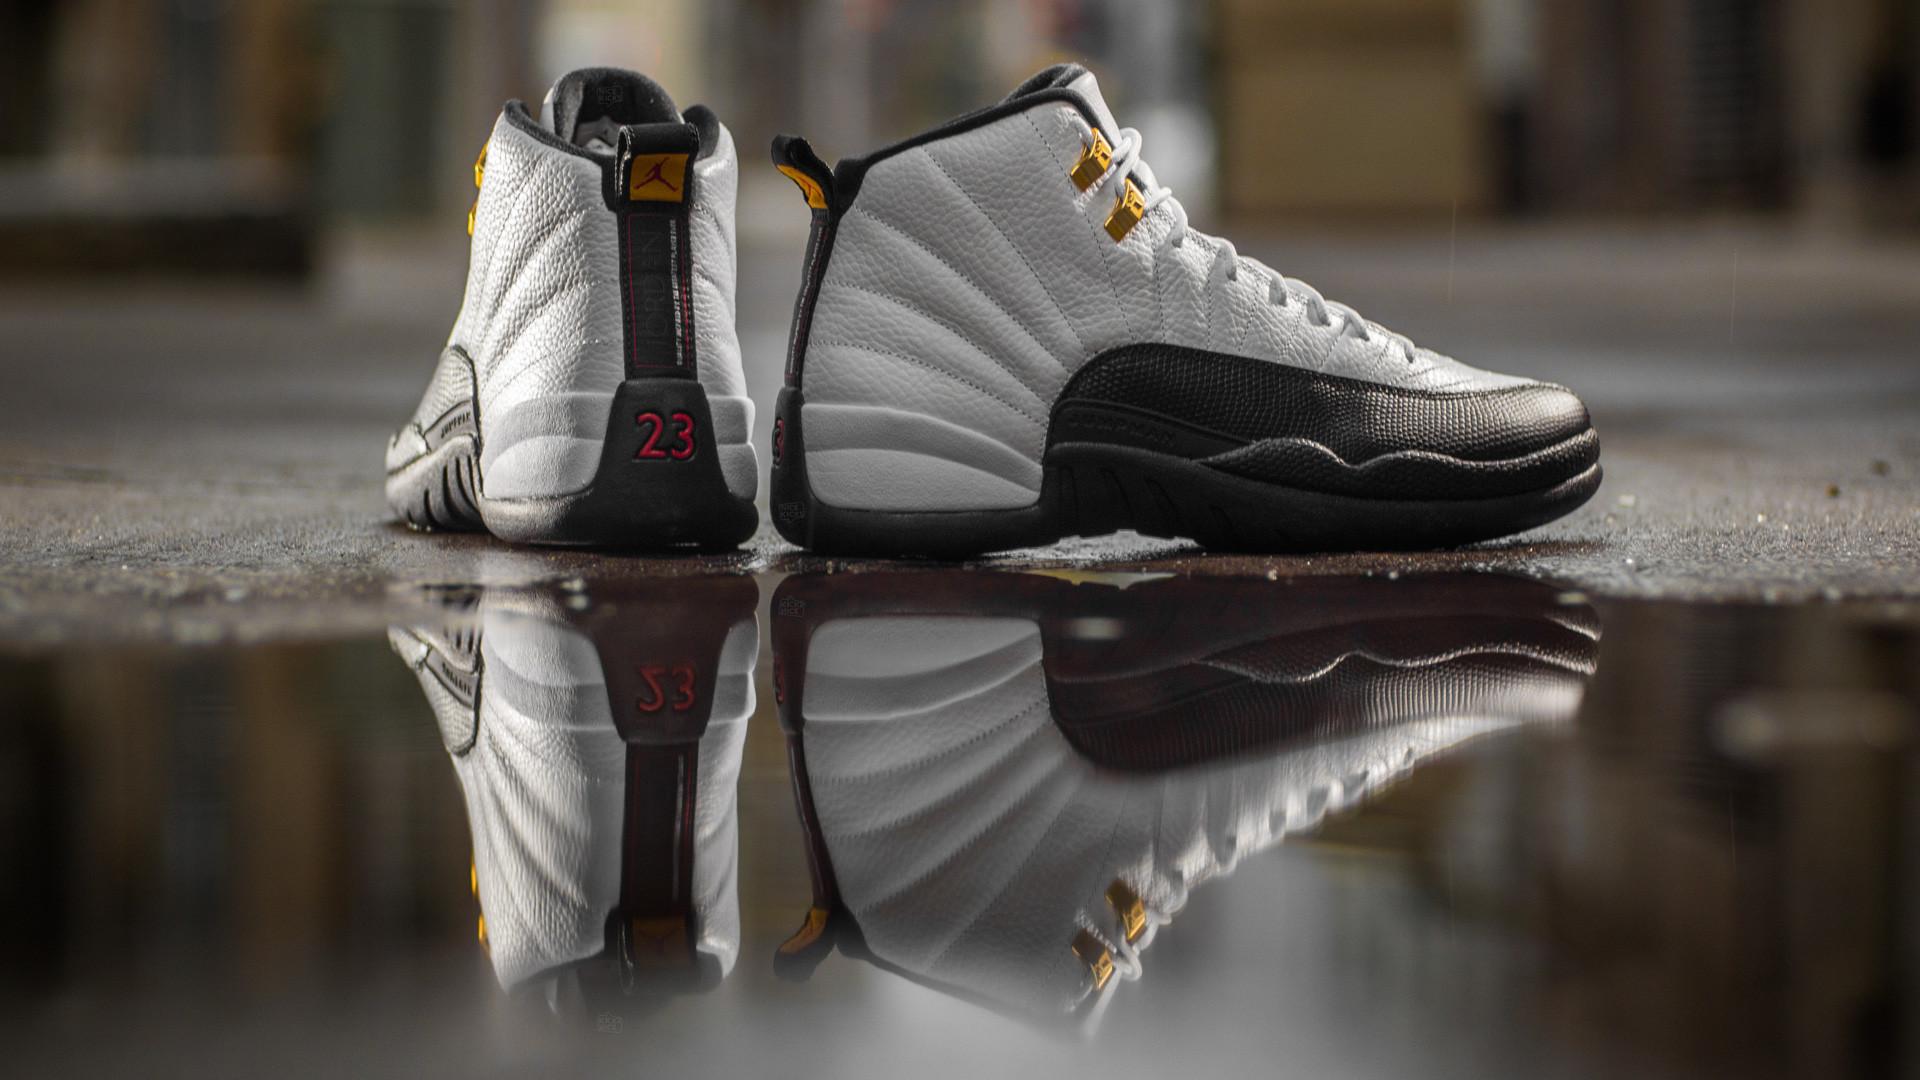 jordan shoes wallpaper,footwear,white,shoe,athletic shoe,sneakers